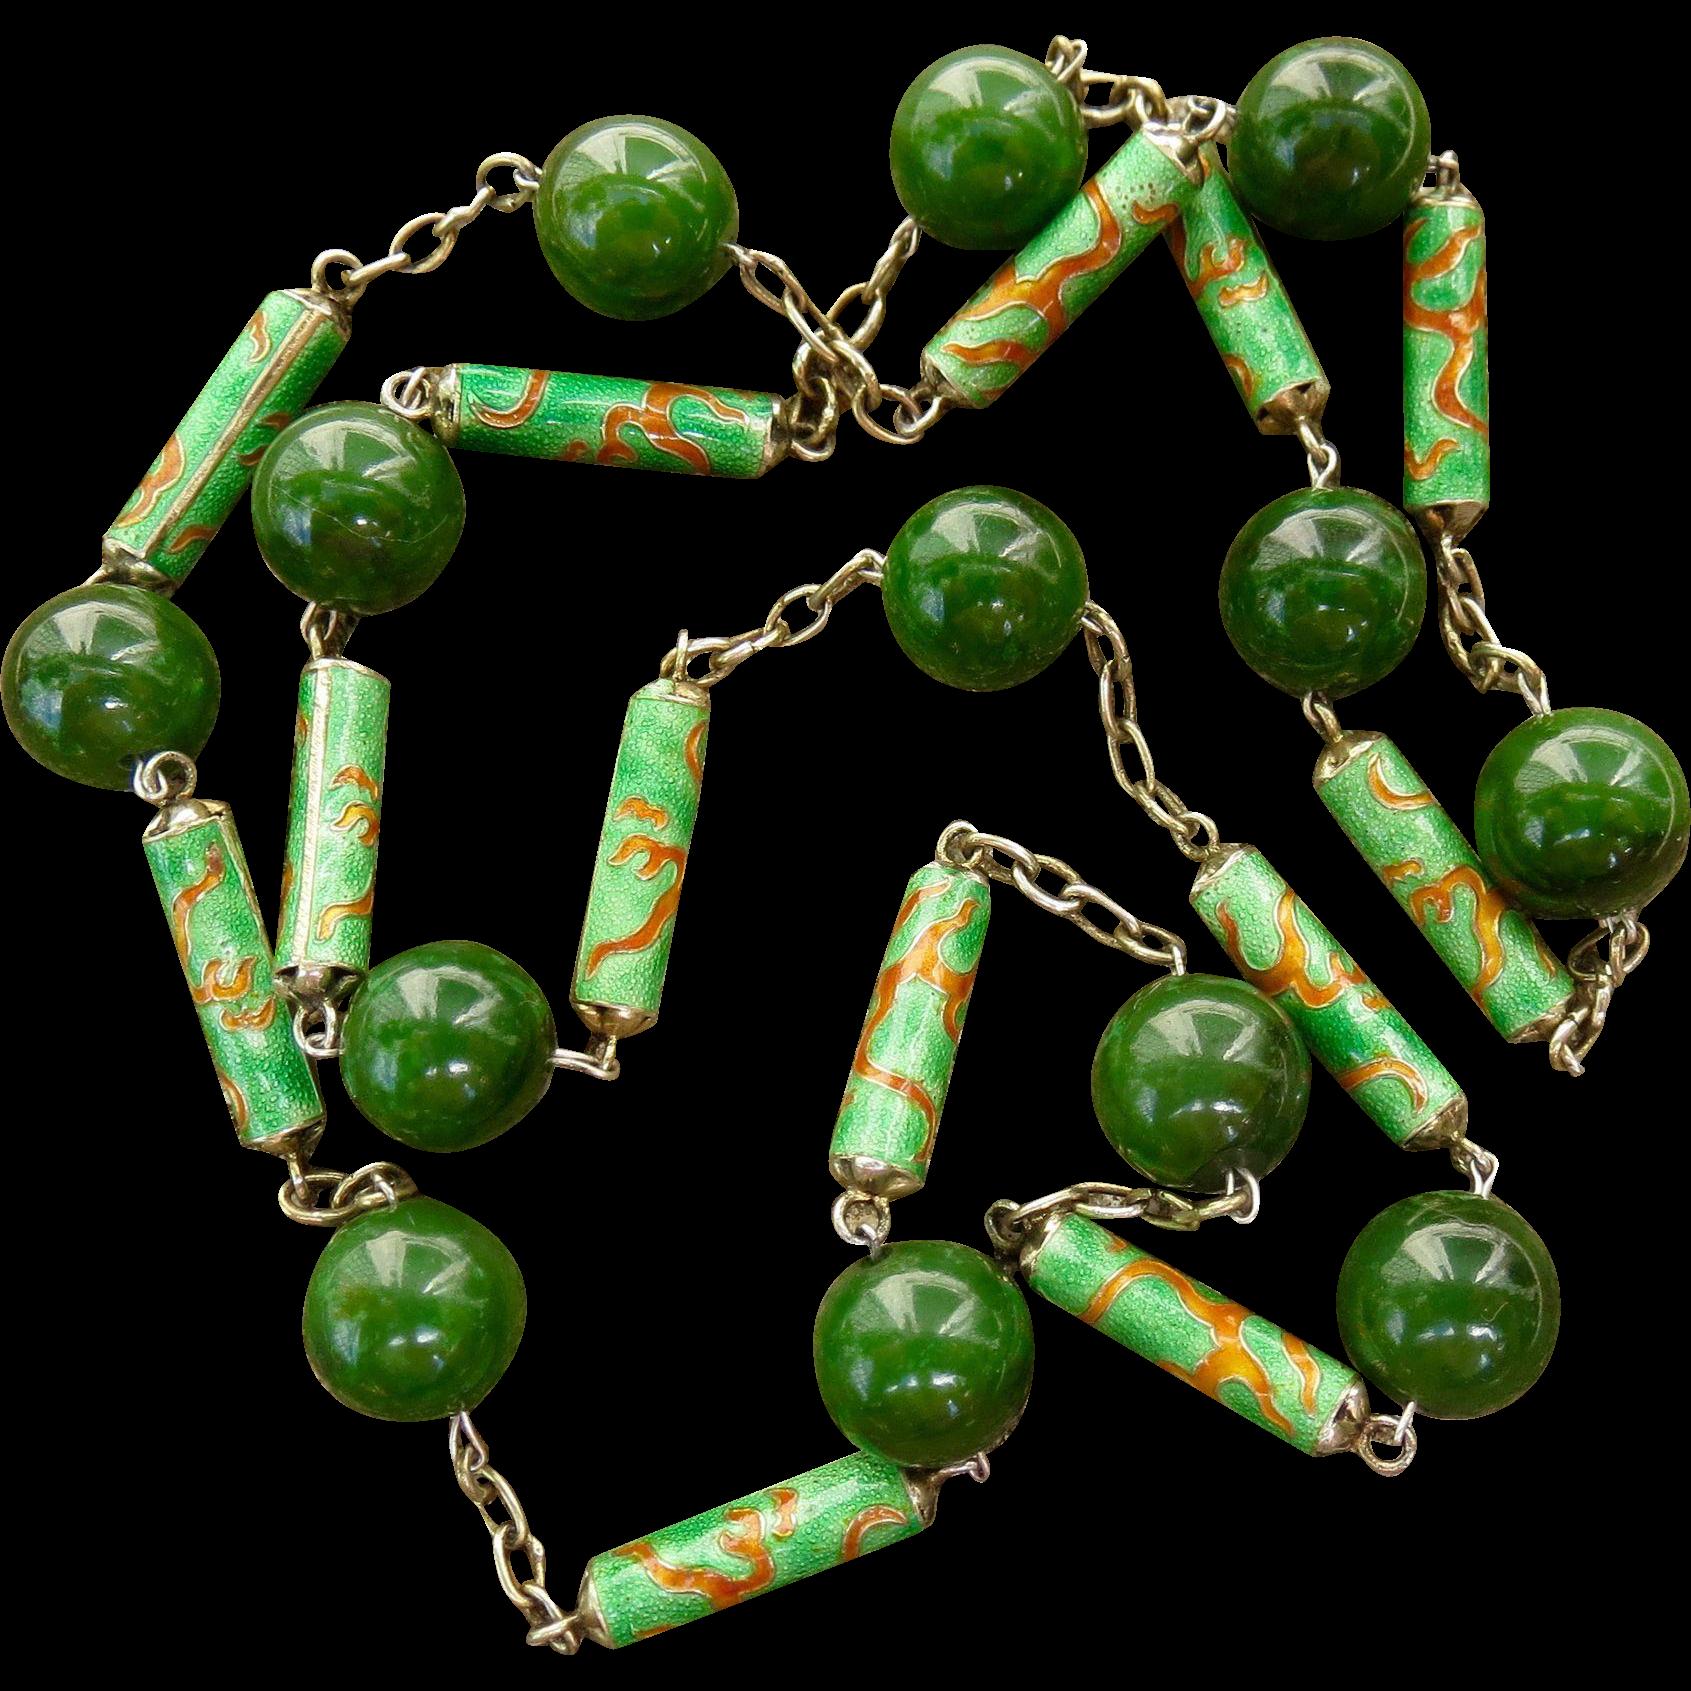 Art Nouveau Chinese Export Jade Sterling Enamel Necklace